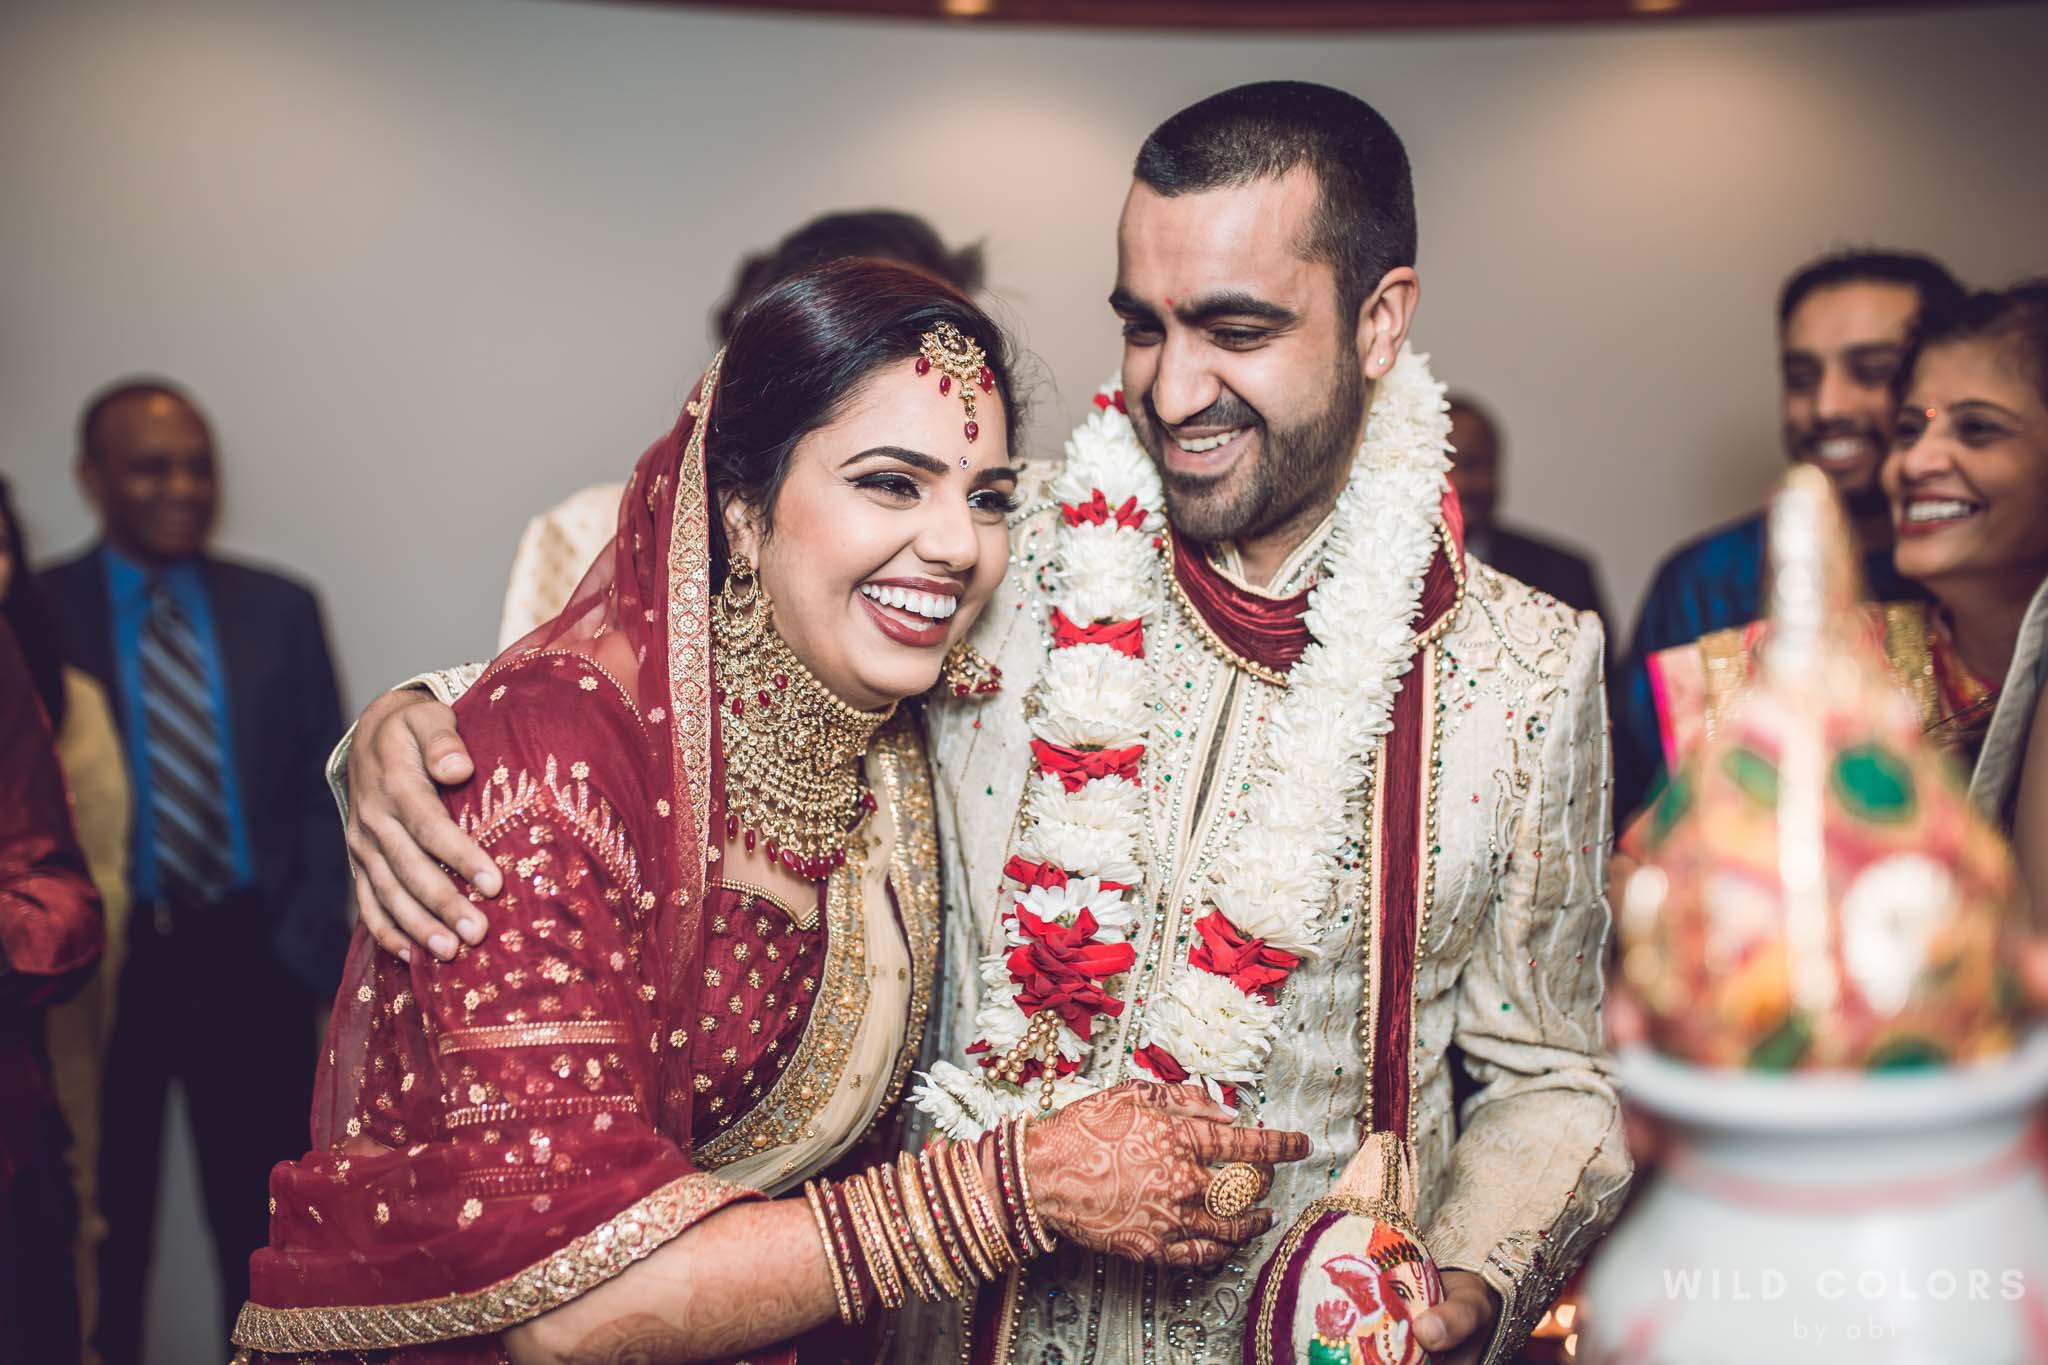 CANDID_INDIAN_WEDDING_ATLANTA_PHOTOGRAPHER-45.JPG